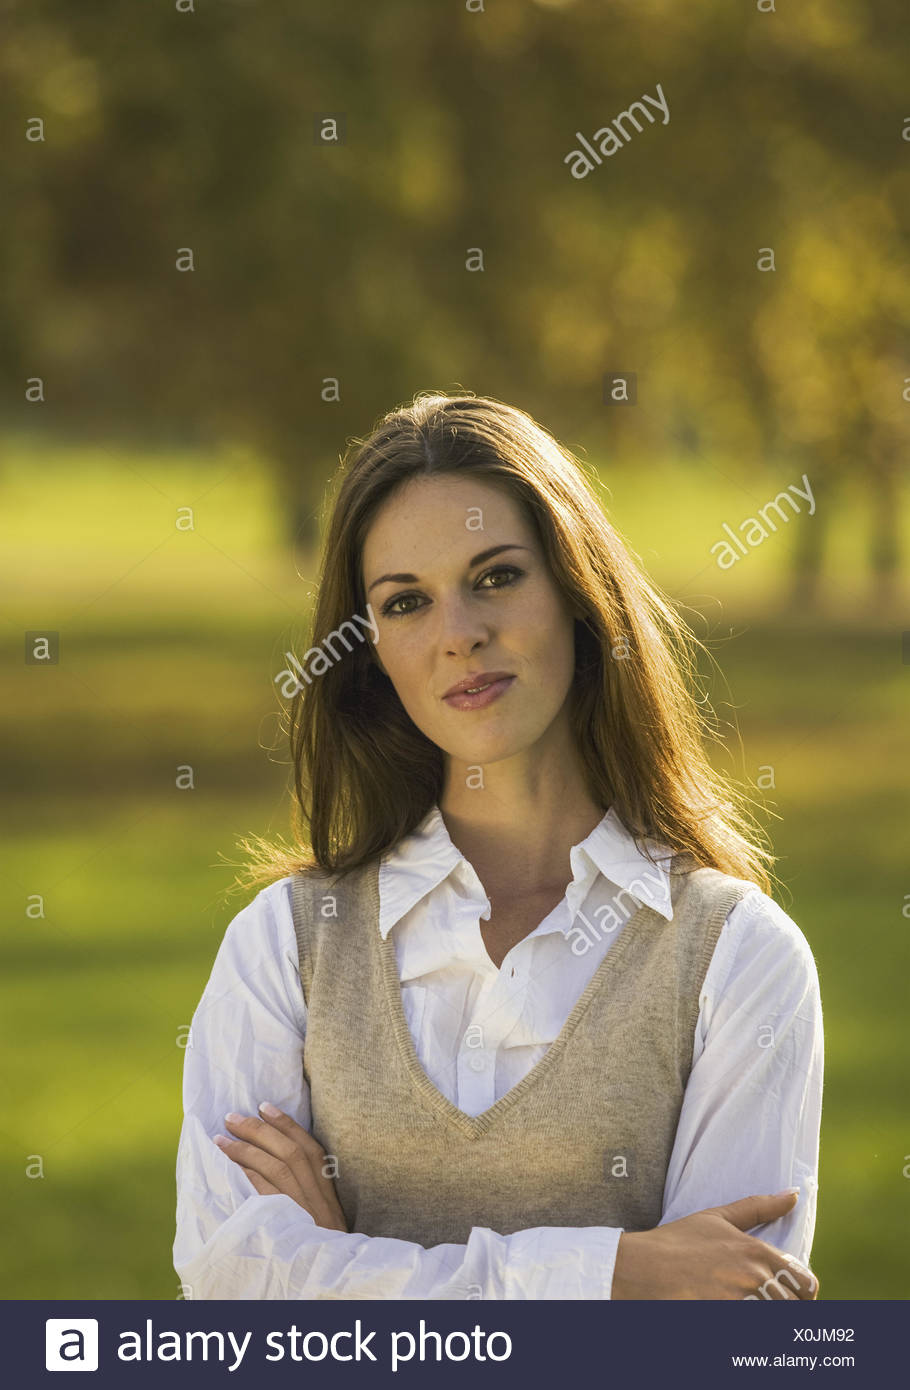 Frau in herbstlichem Park, verschraenkte Arme, Halbportraet (model-released) Stock Photo